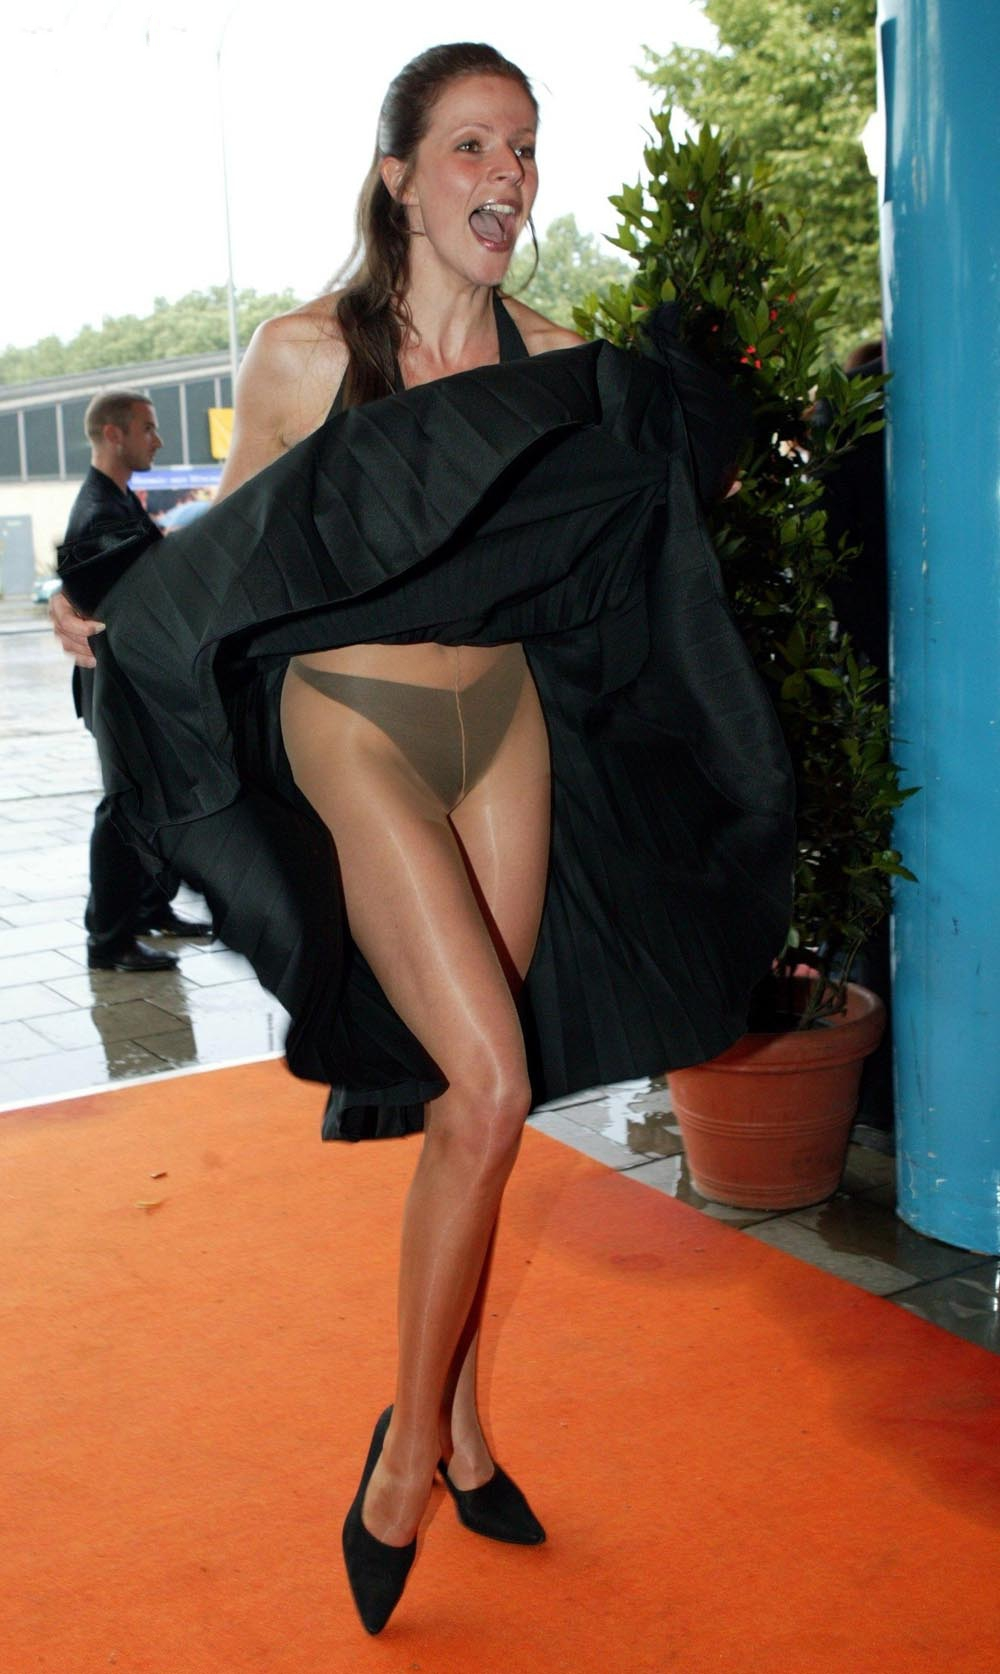 Леонора Капелль голая. Фото - 9